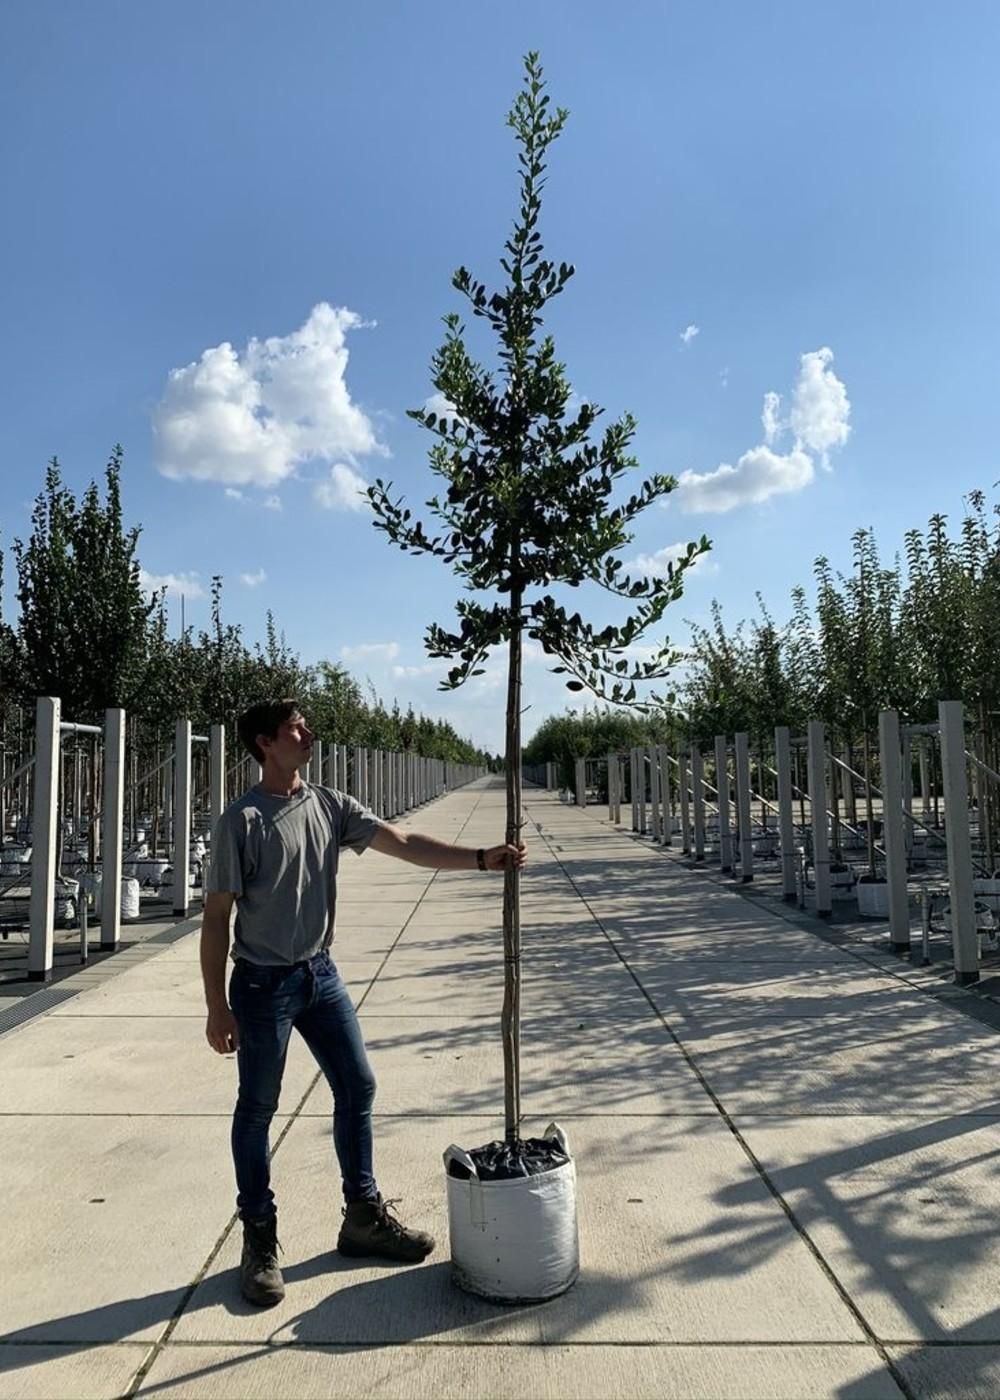 Ganzrandige Stechpalme | lex aquifolium 'J.C. van Tol'